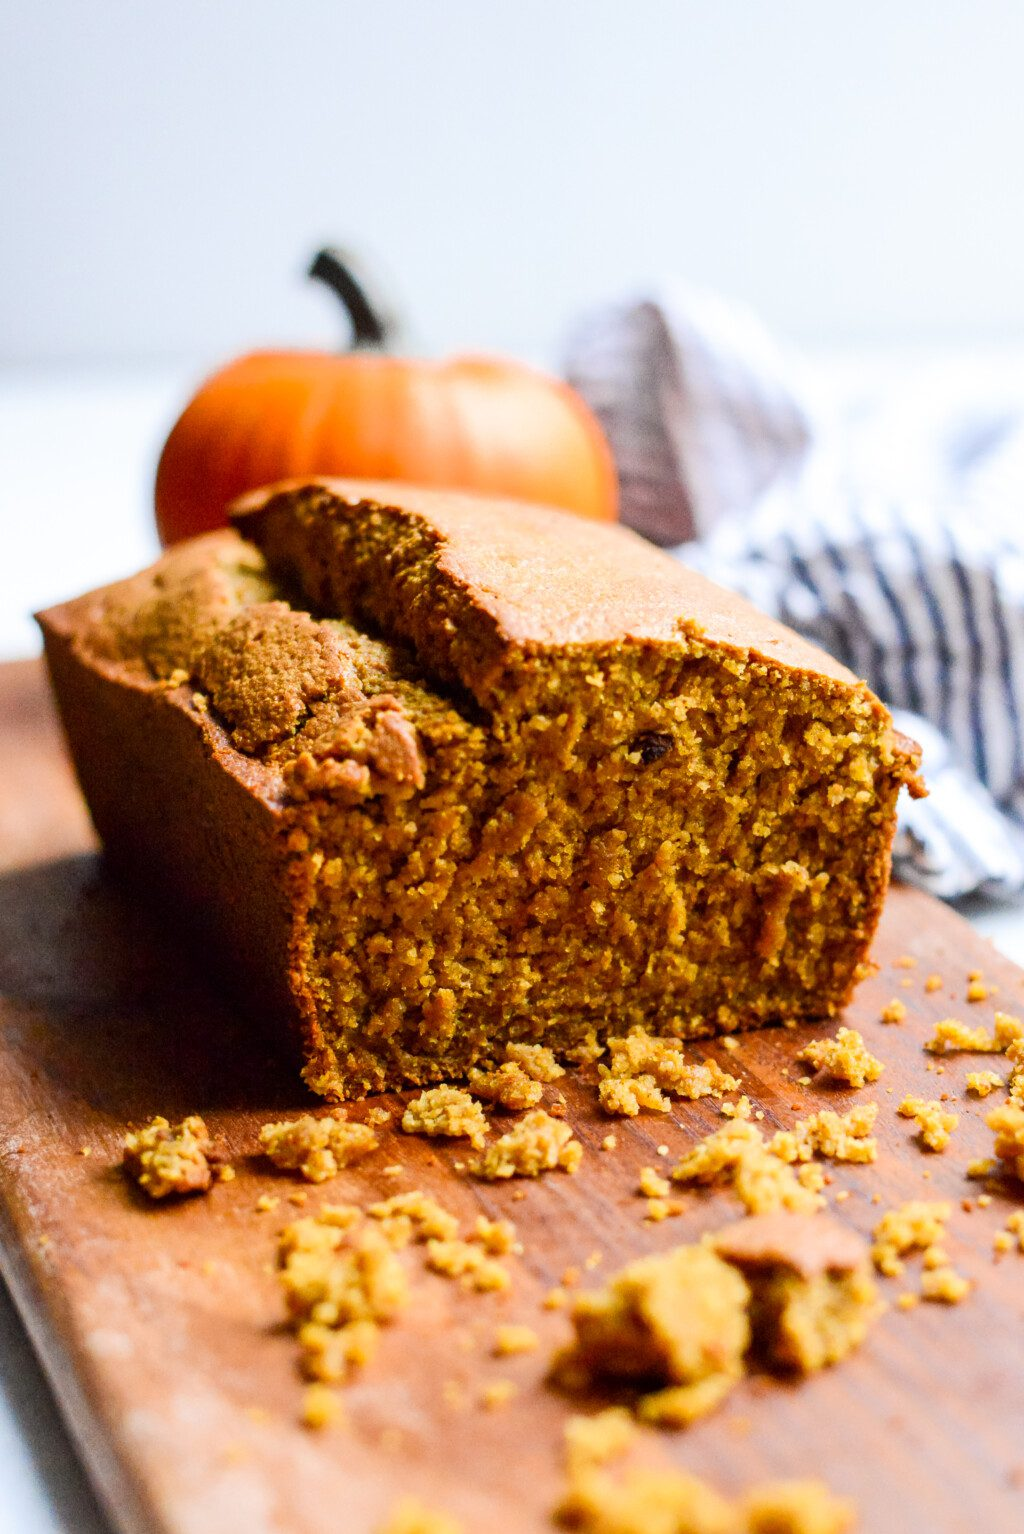 close up of a cut loaf of gluten free pumpkin bread on wooden cutting board